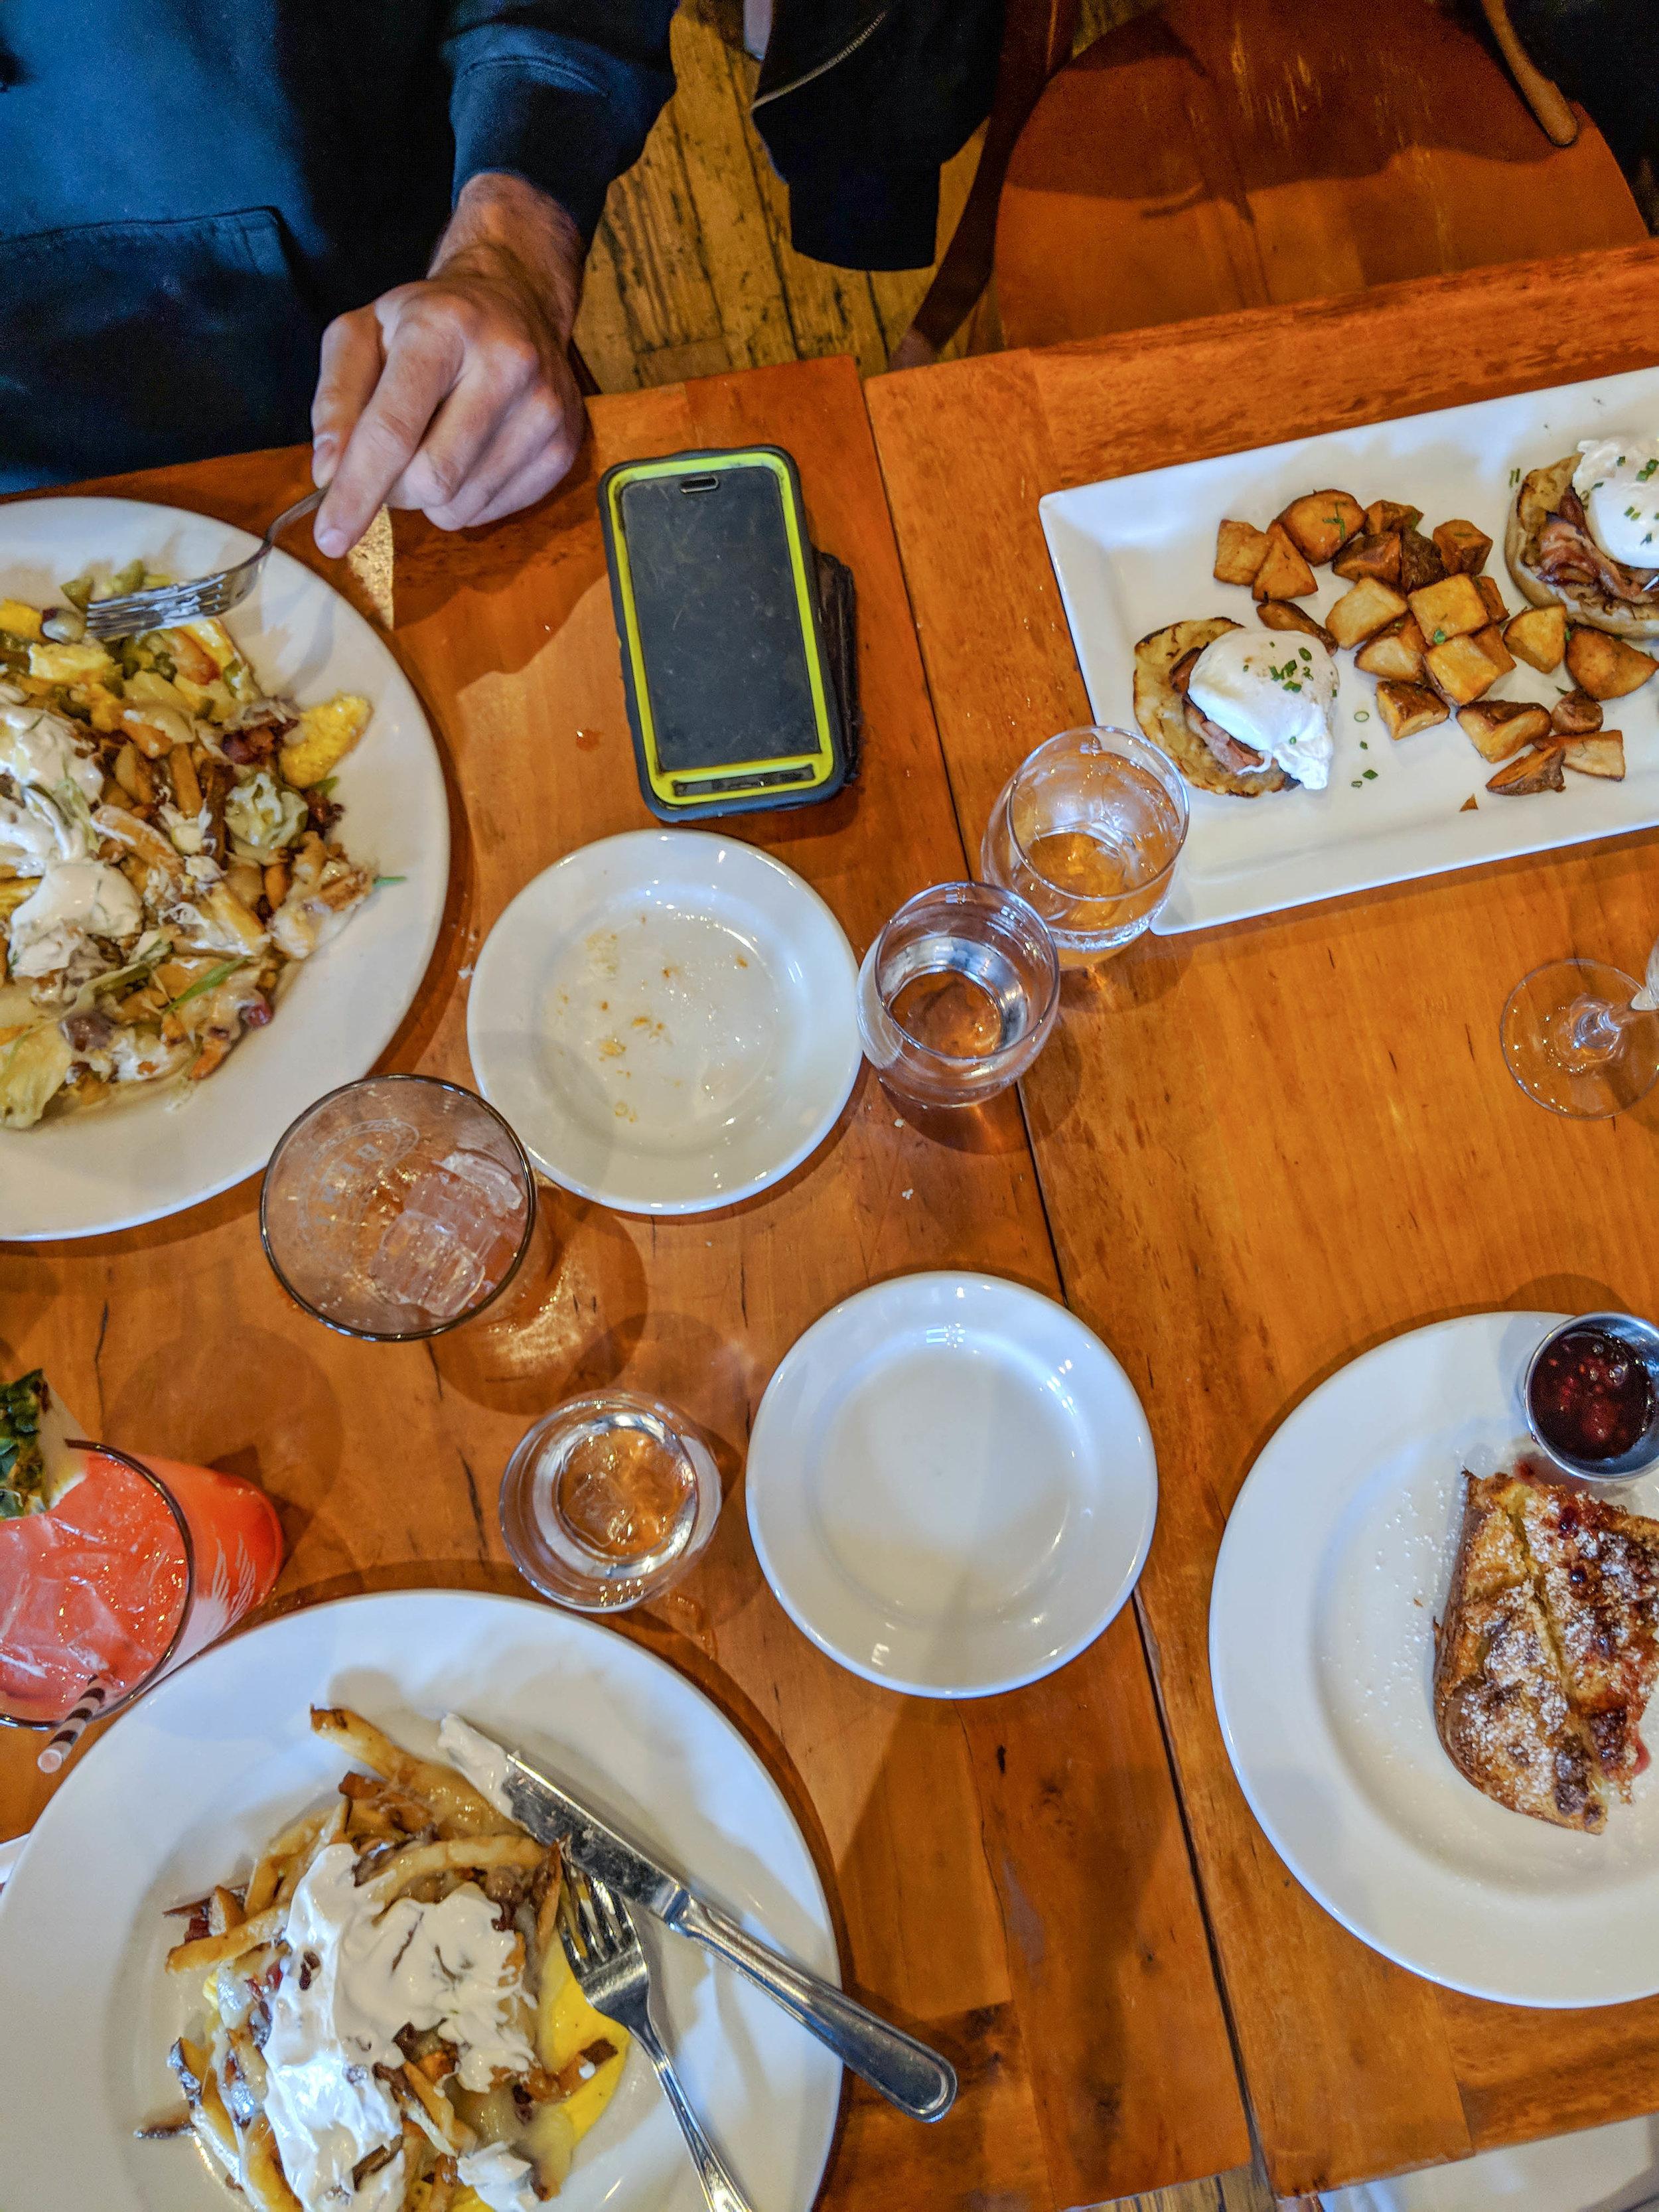 bri rinehart; photography; ashmont grill; food